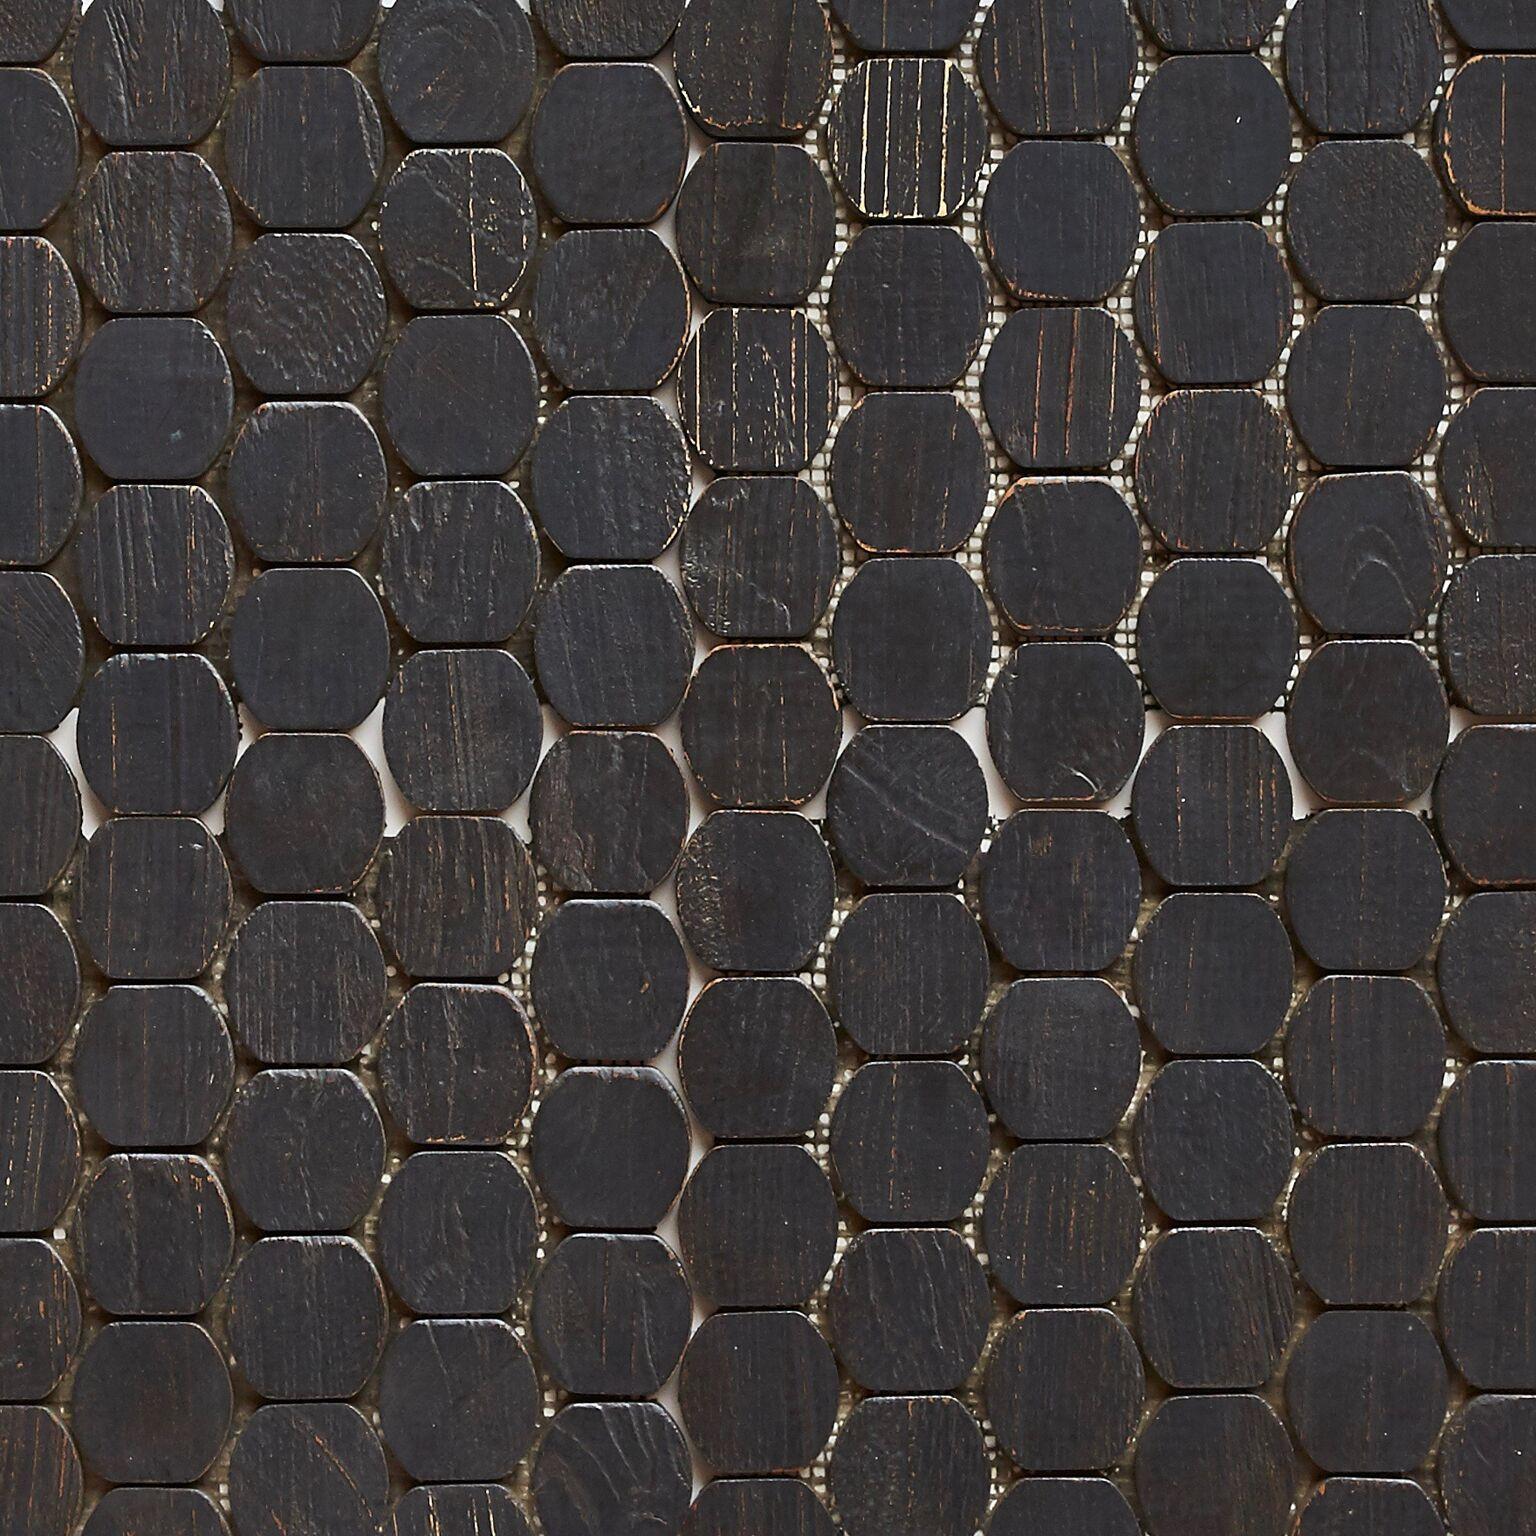 black matte finish 5 - Teak Tile - Cask